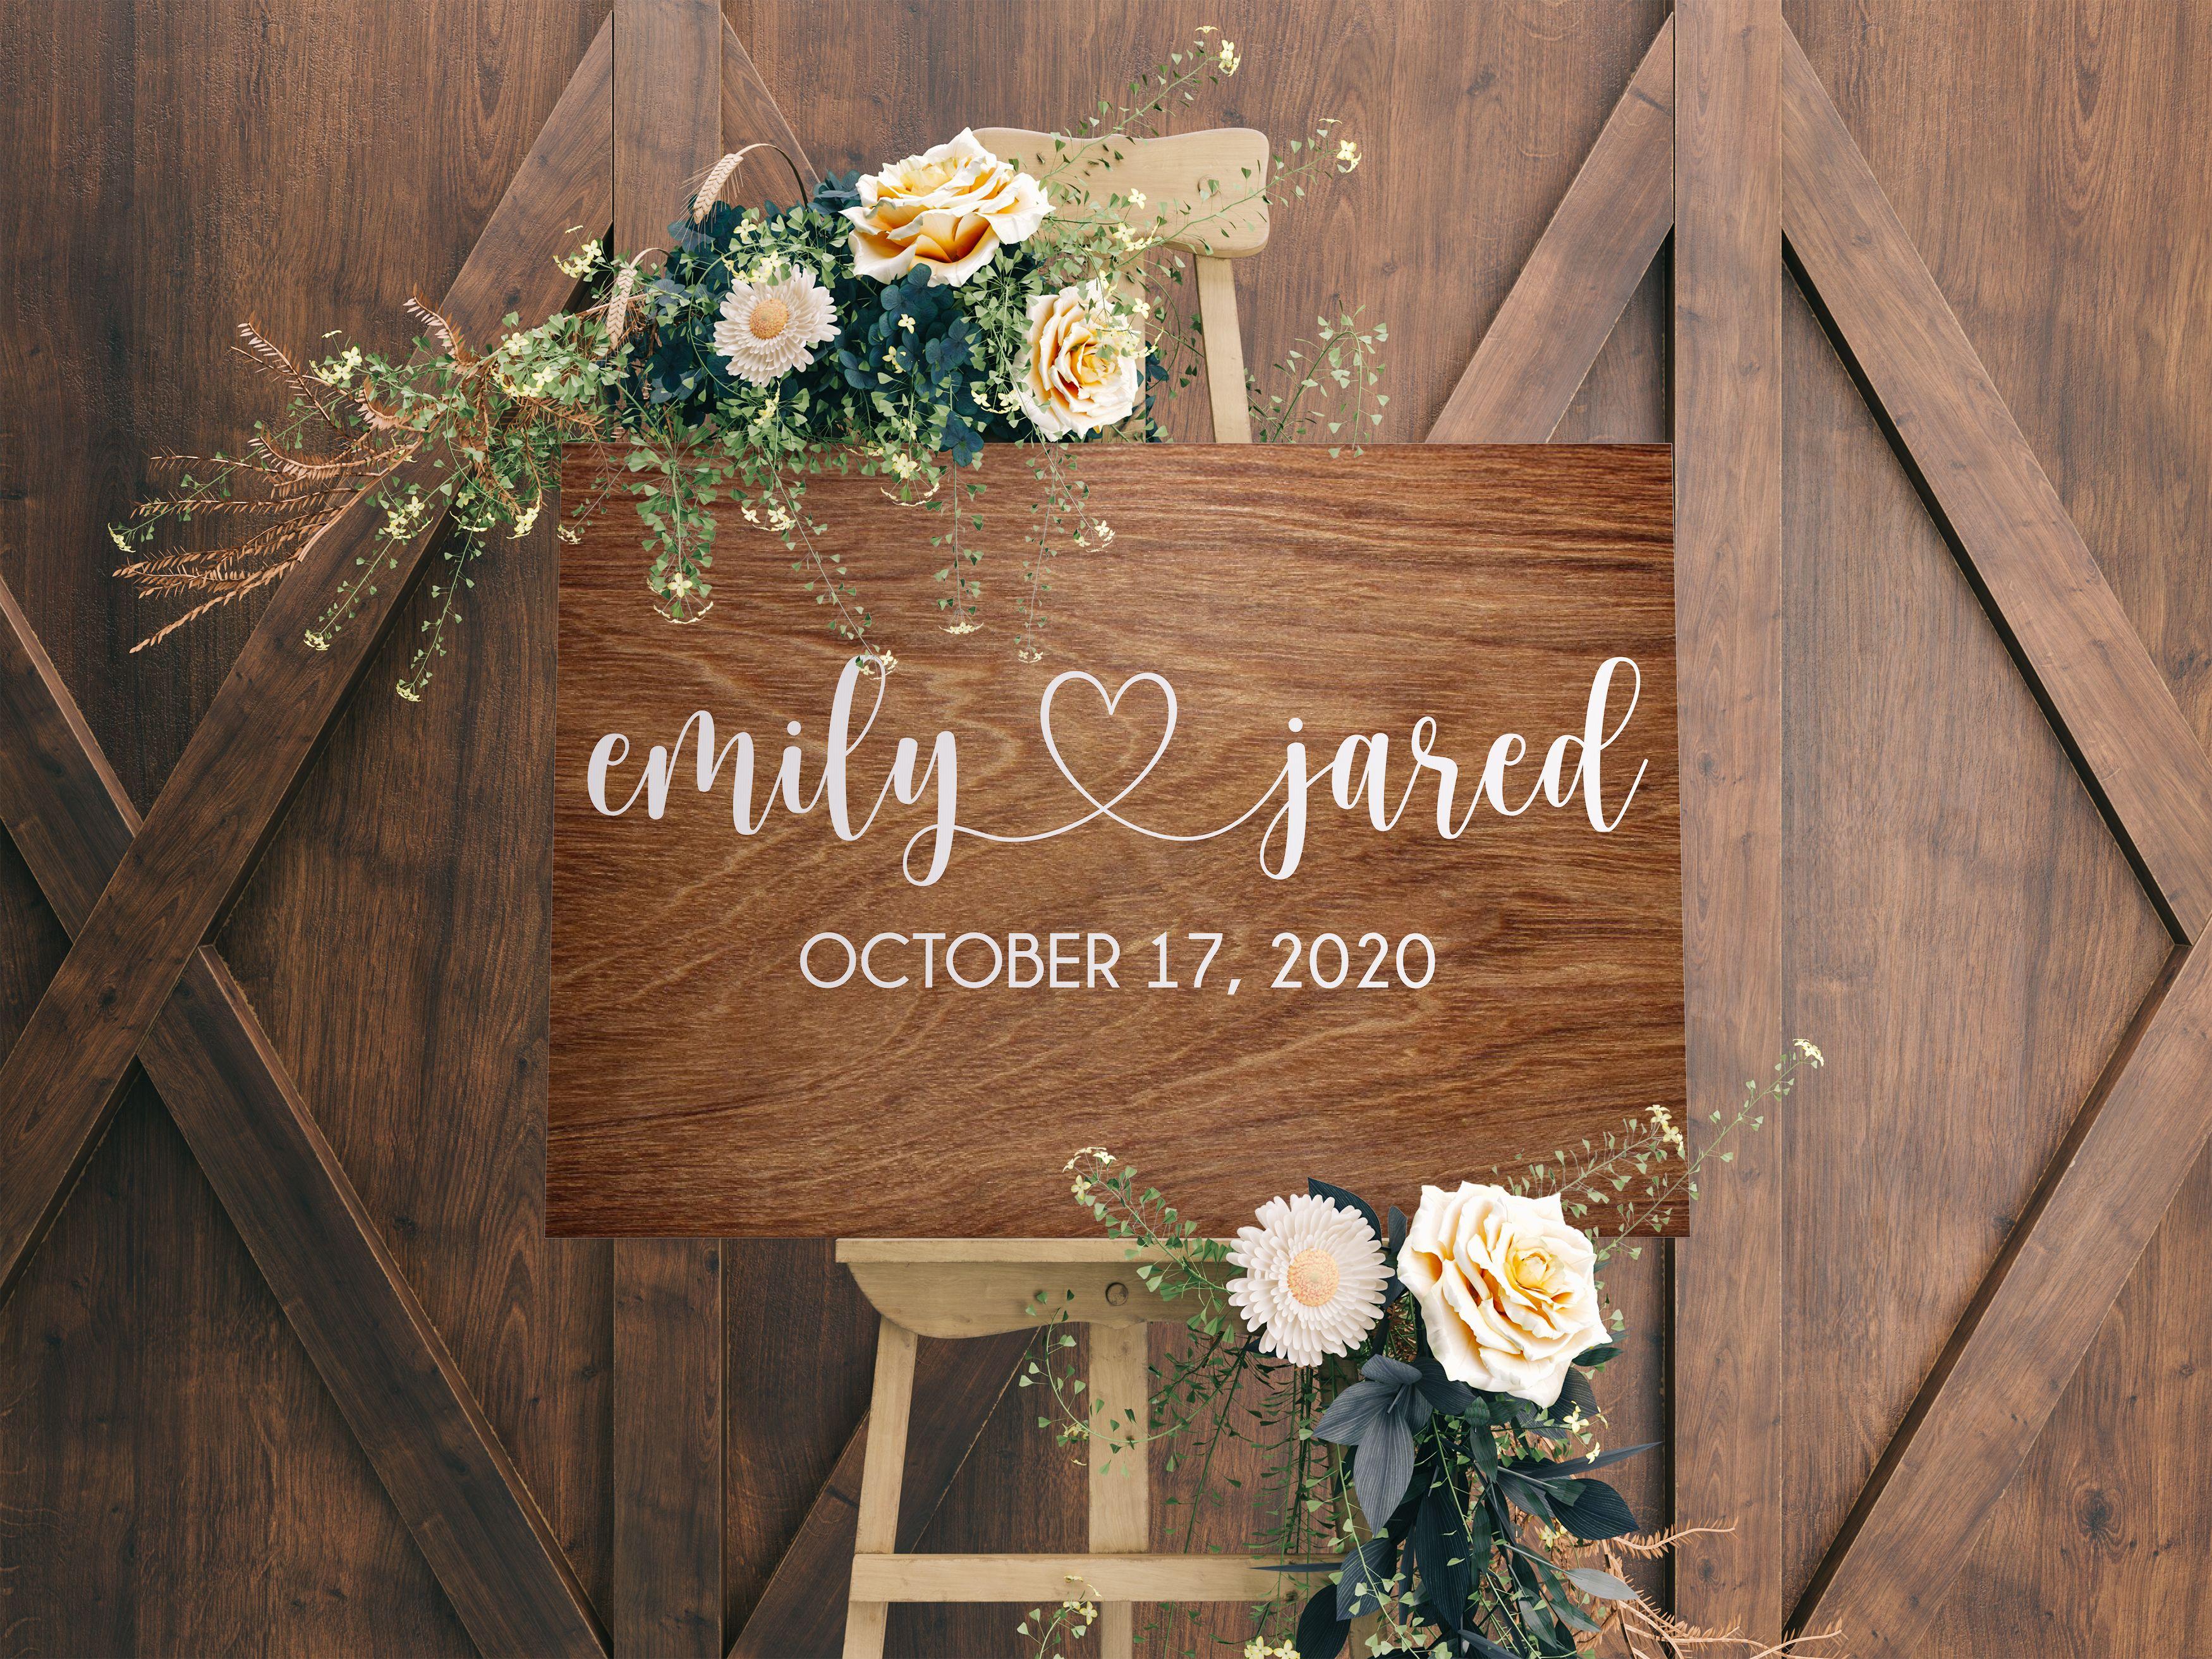 Wedding Sign Wedding Welcome Sign Welcome Wedding Sign Etsy Wood Wedding Signs Wedding Welcome Signs Wood Wedding Signs Rustic